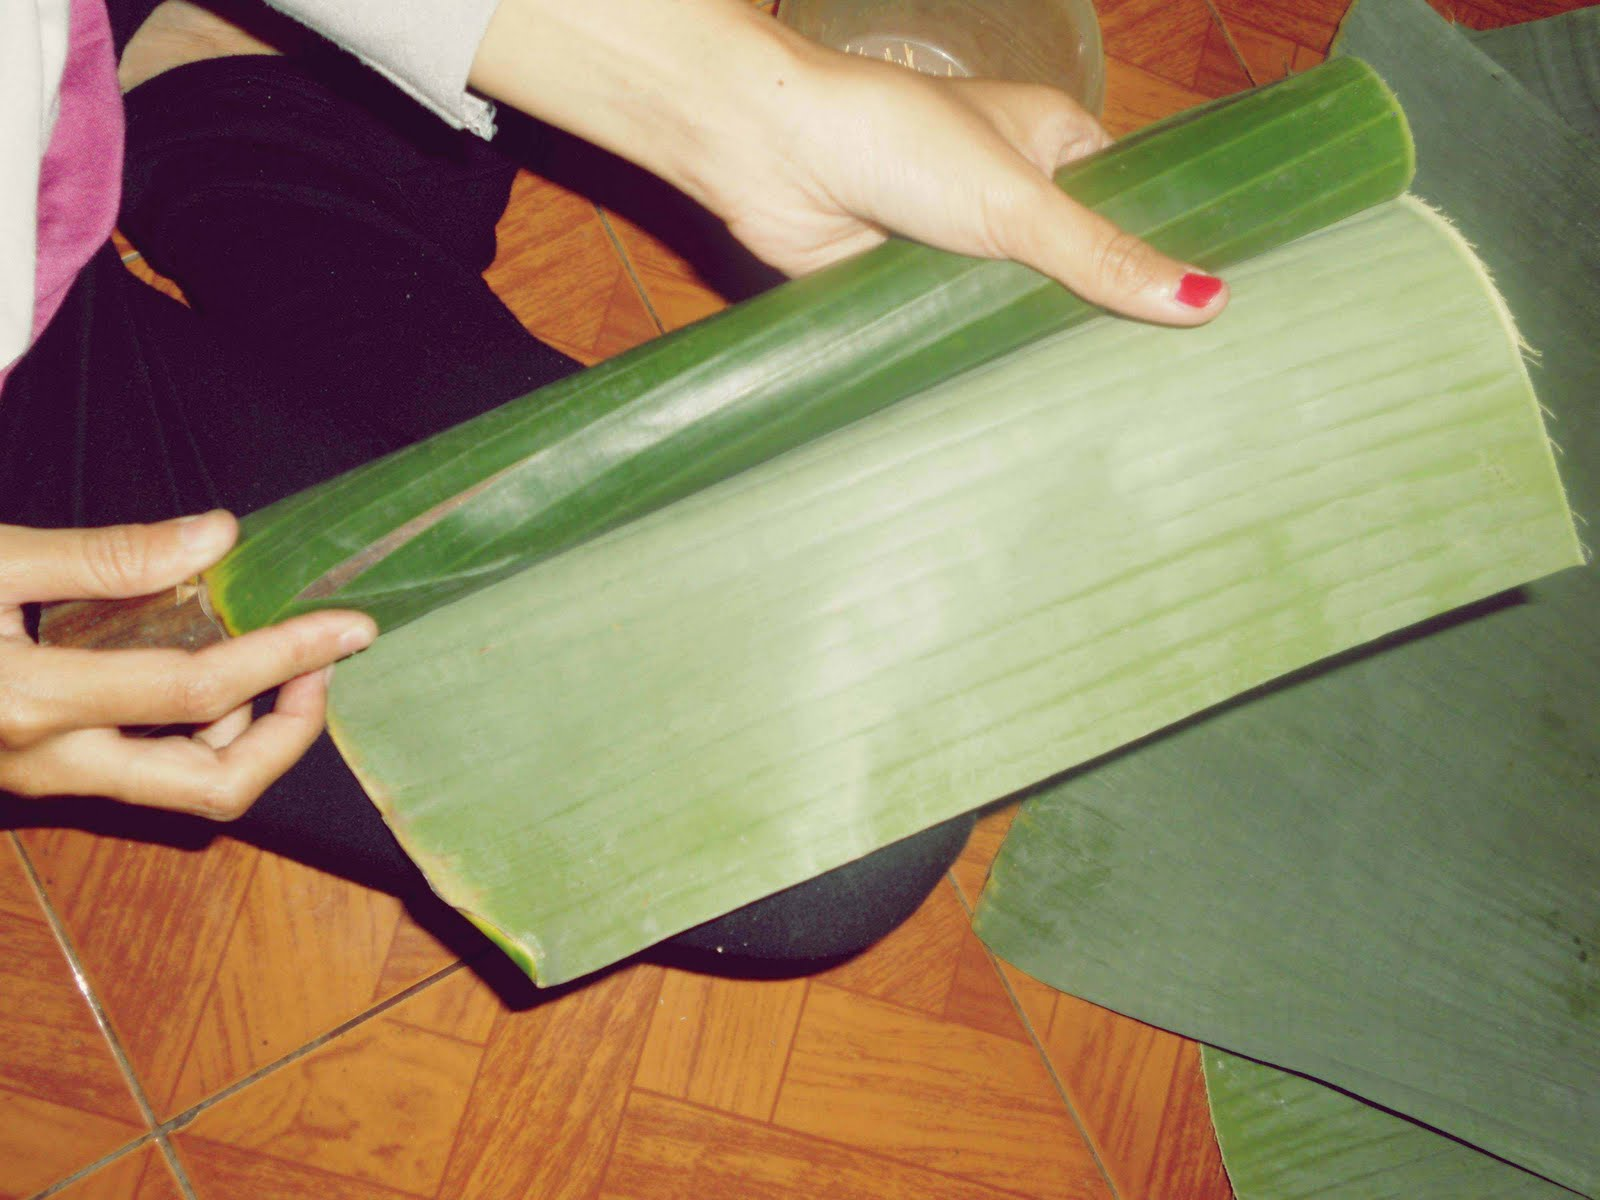 Ambil daun pisang, kemudian gulung dengan cetakan bambu